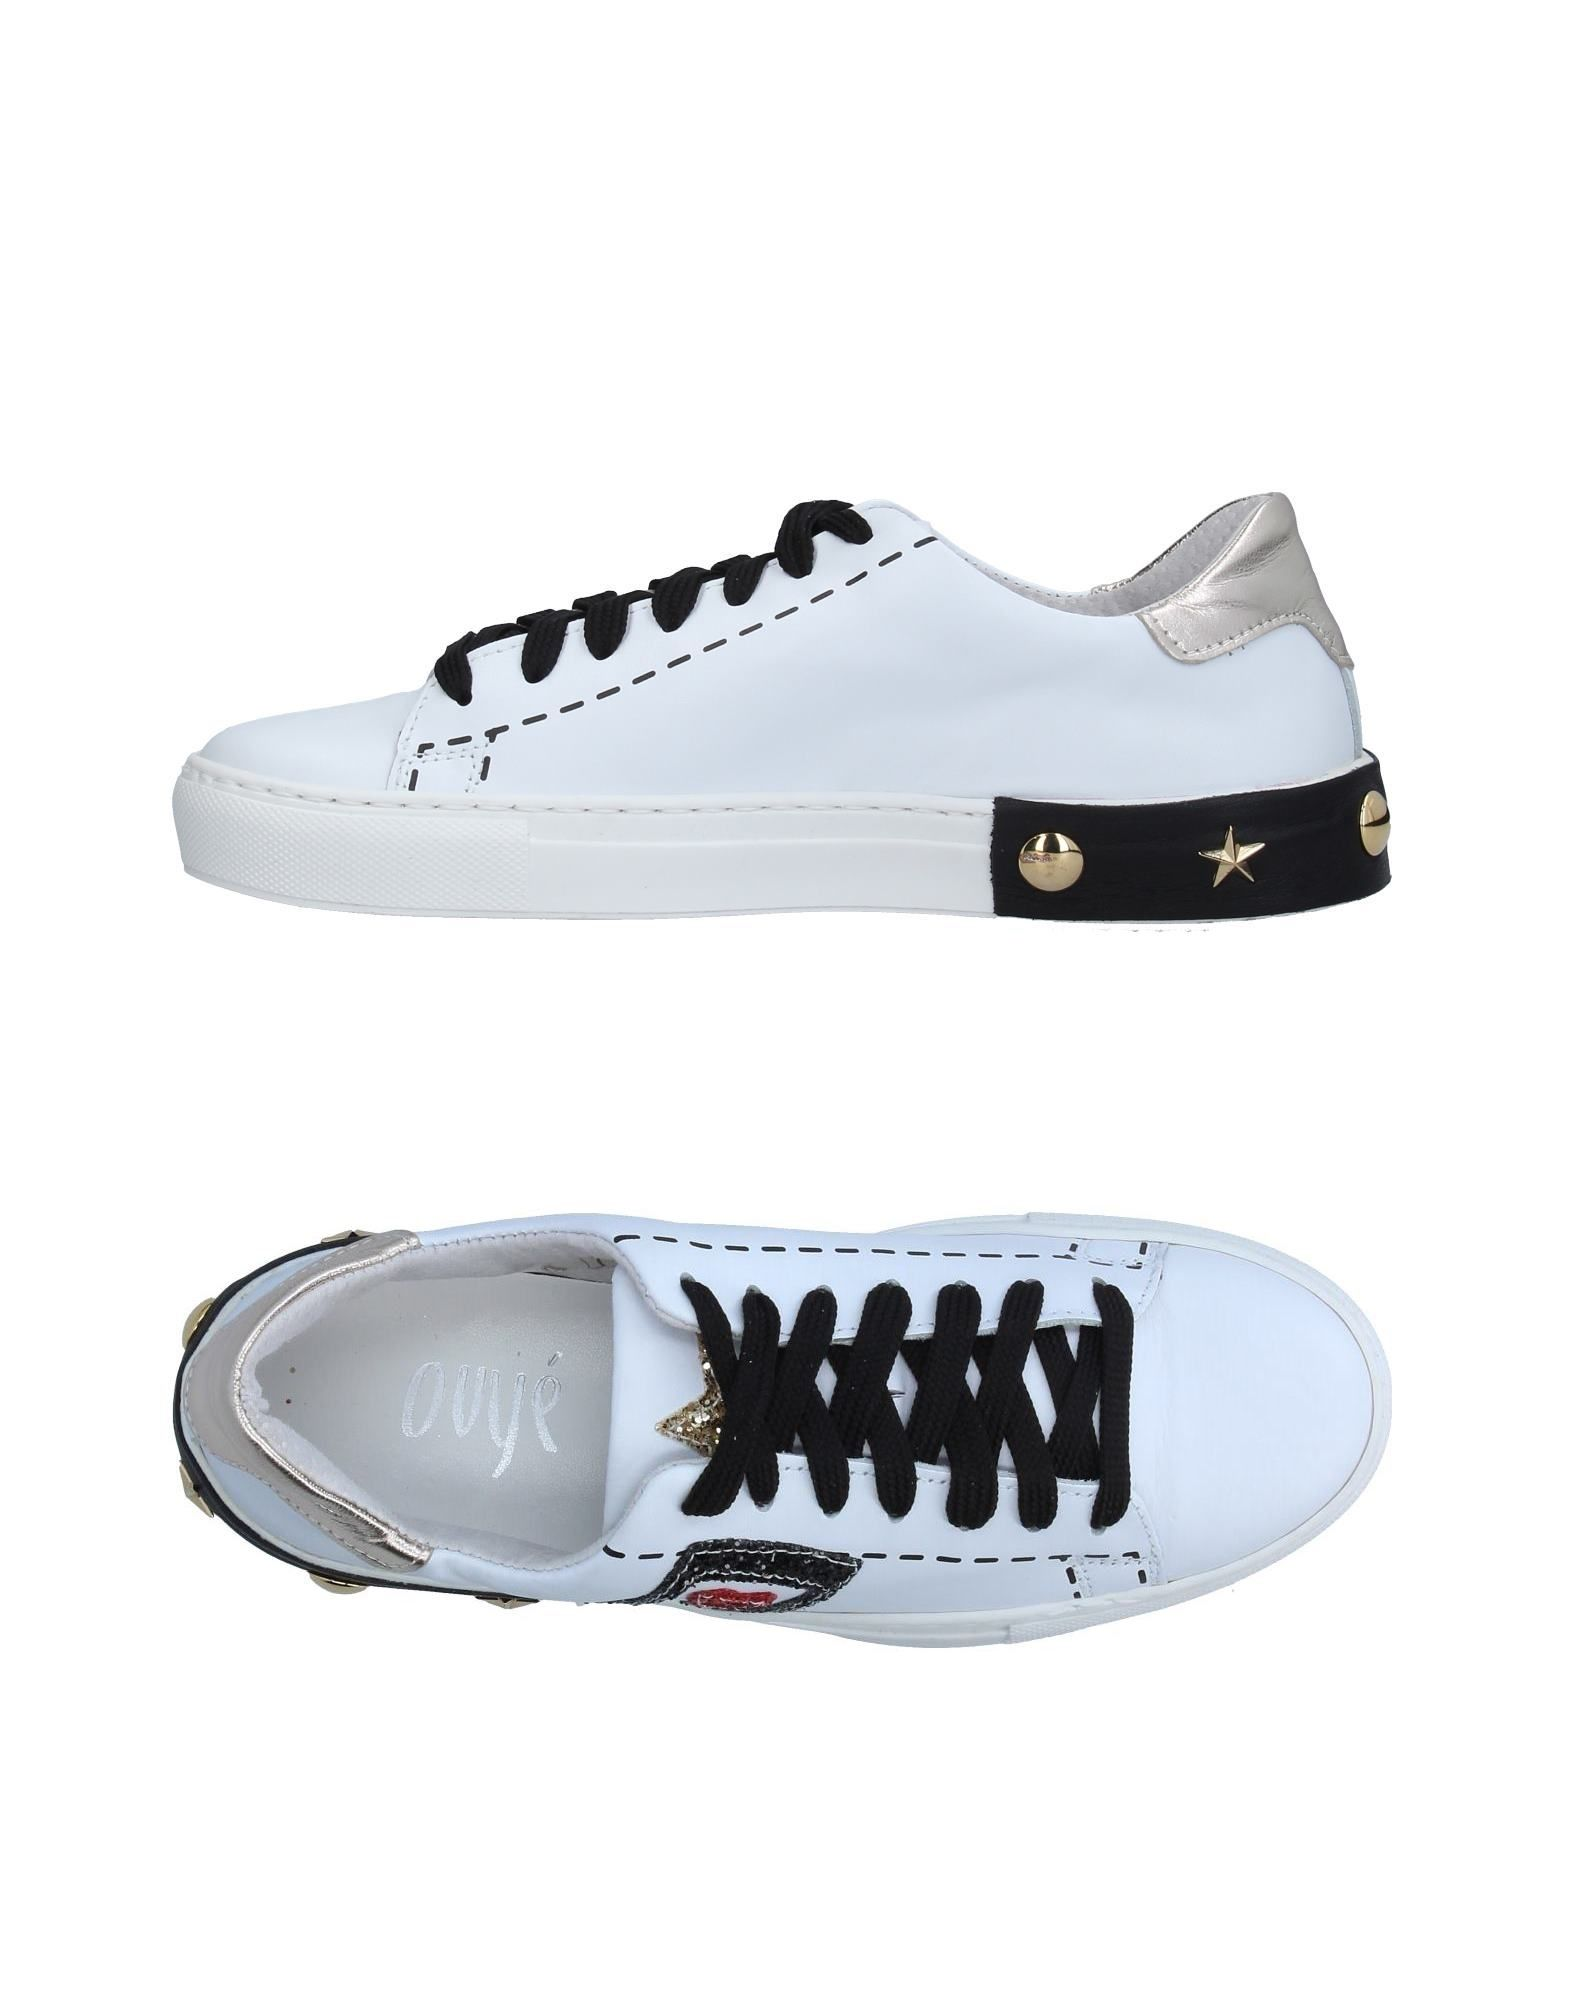 OVYE´ by CRISTINA LUCCHI Damen Low Sneakers & Tennisschuhe Farbe Weiß Größe 9